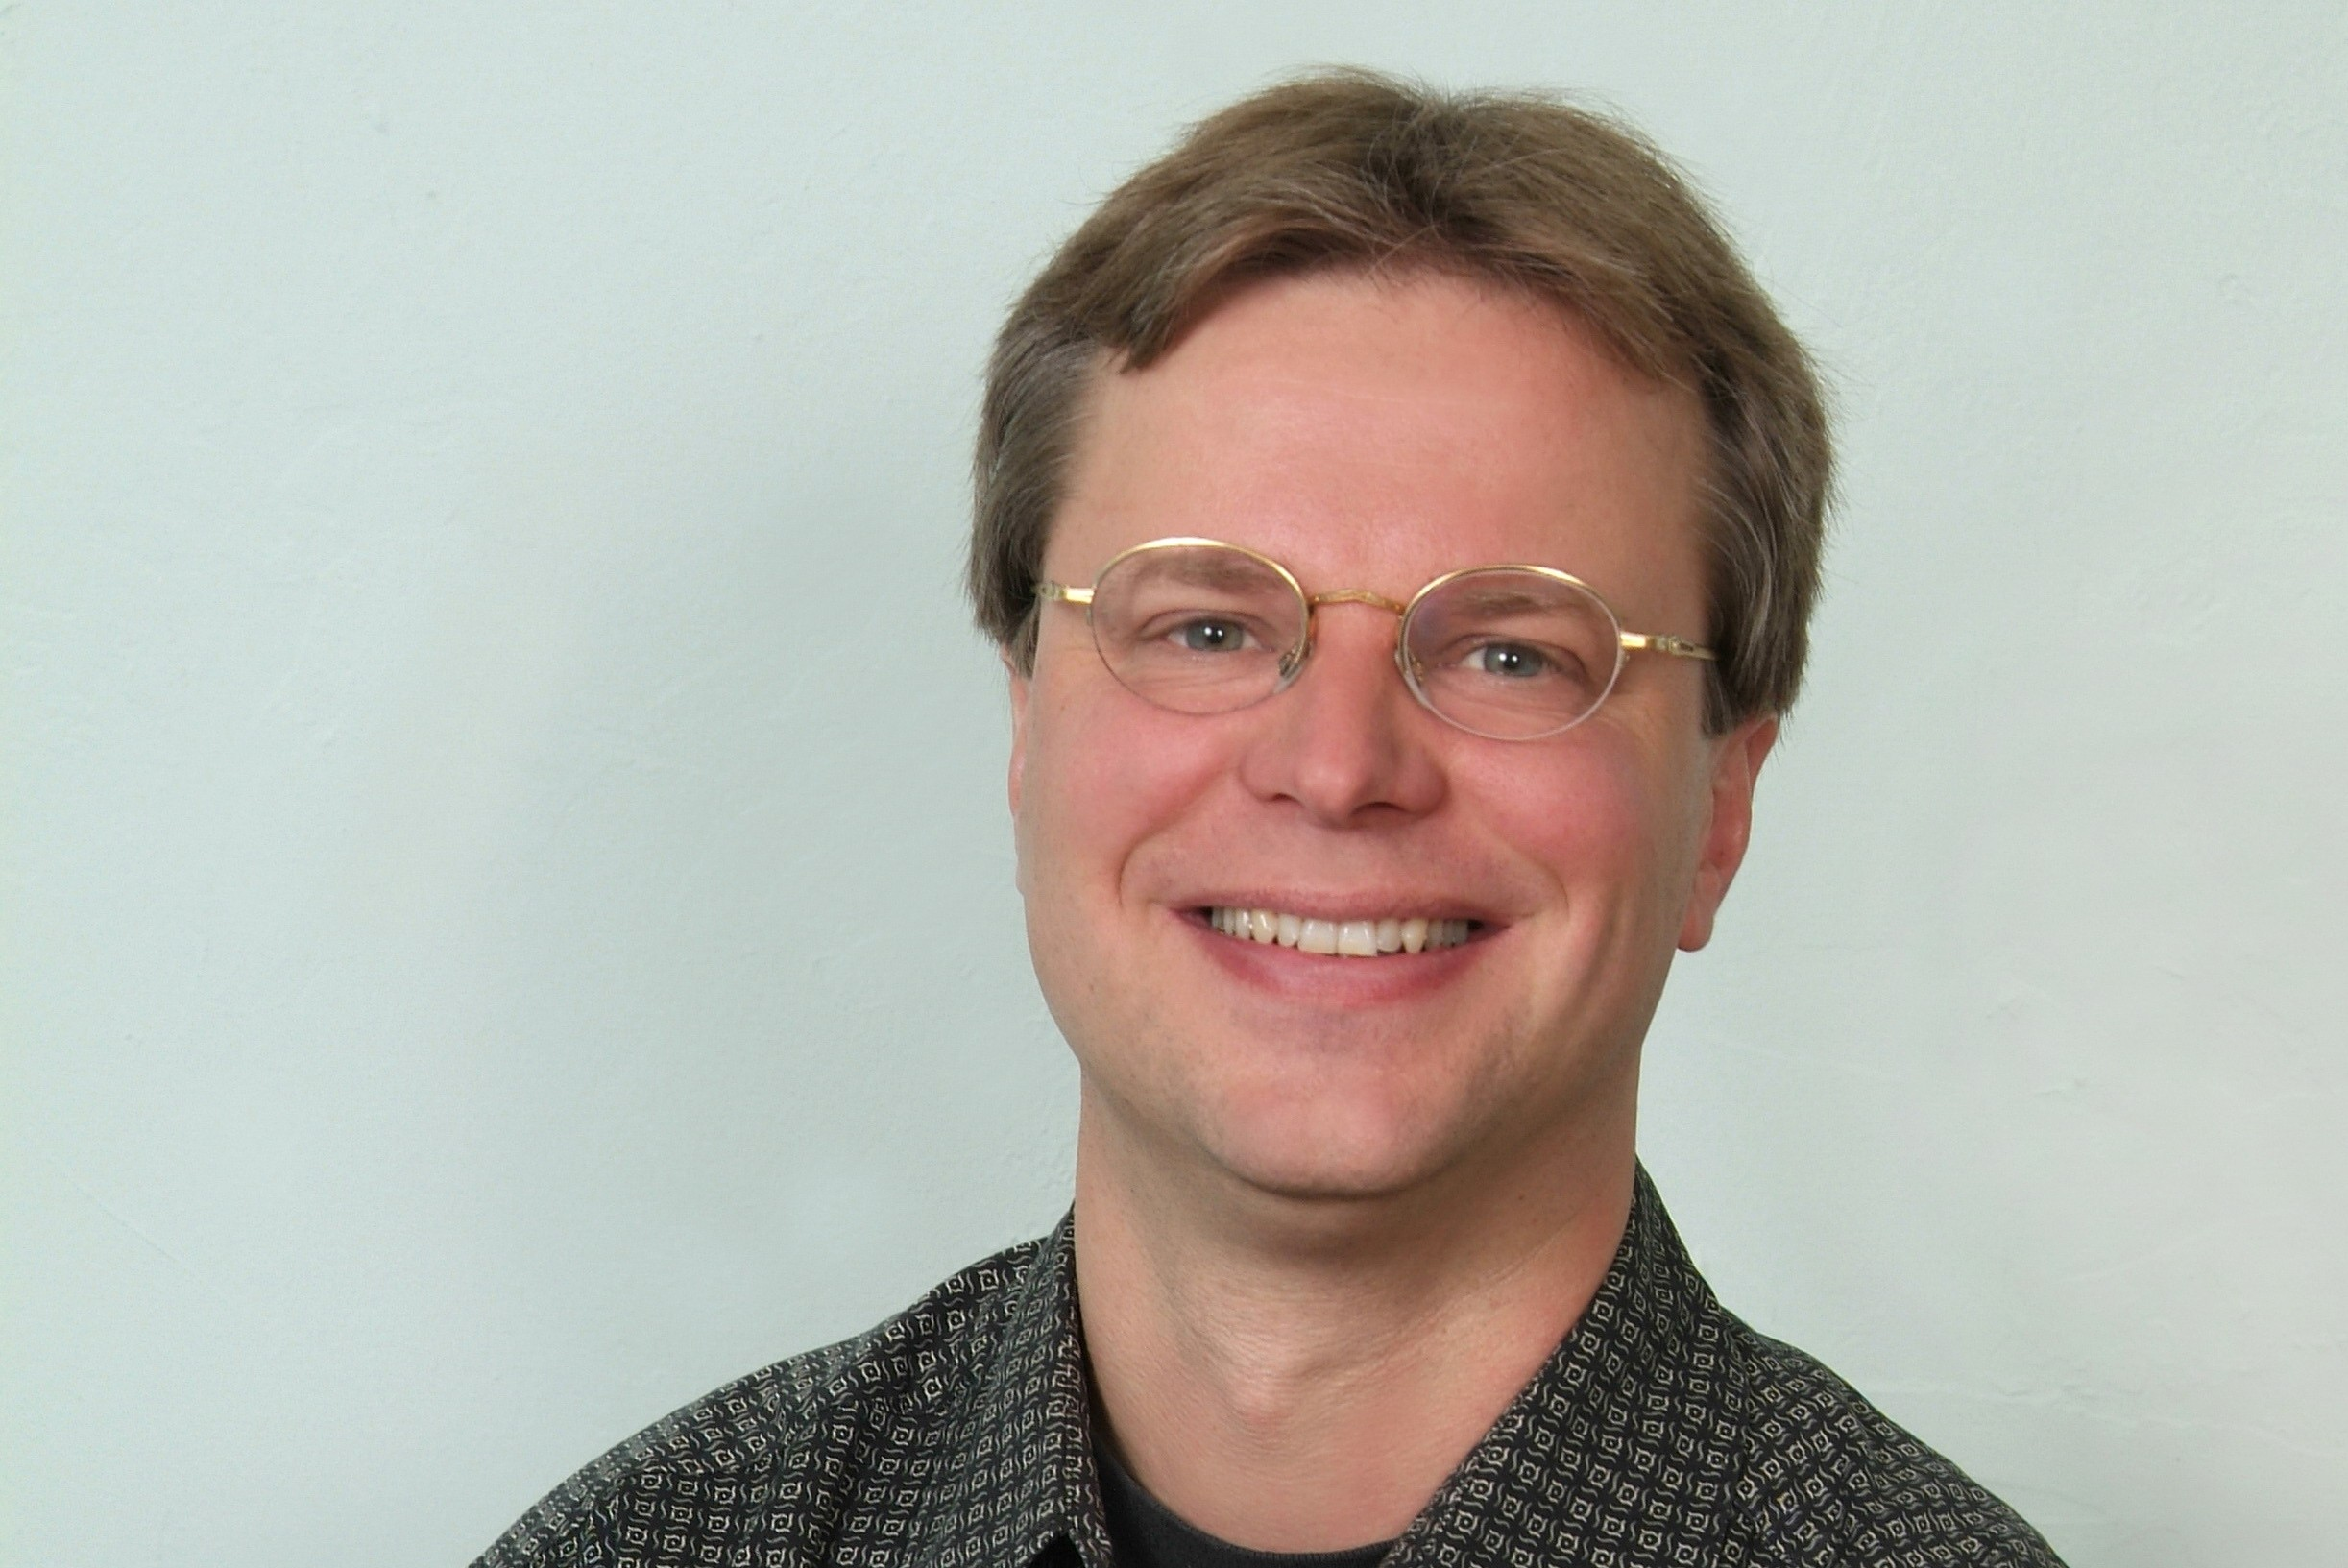 Konstantin_Guericke_CEO_ jaxtr